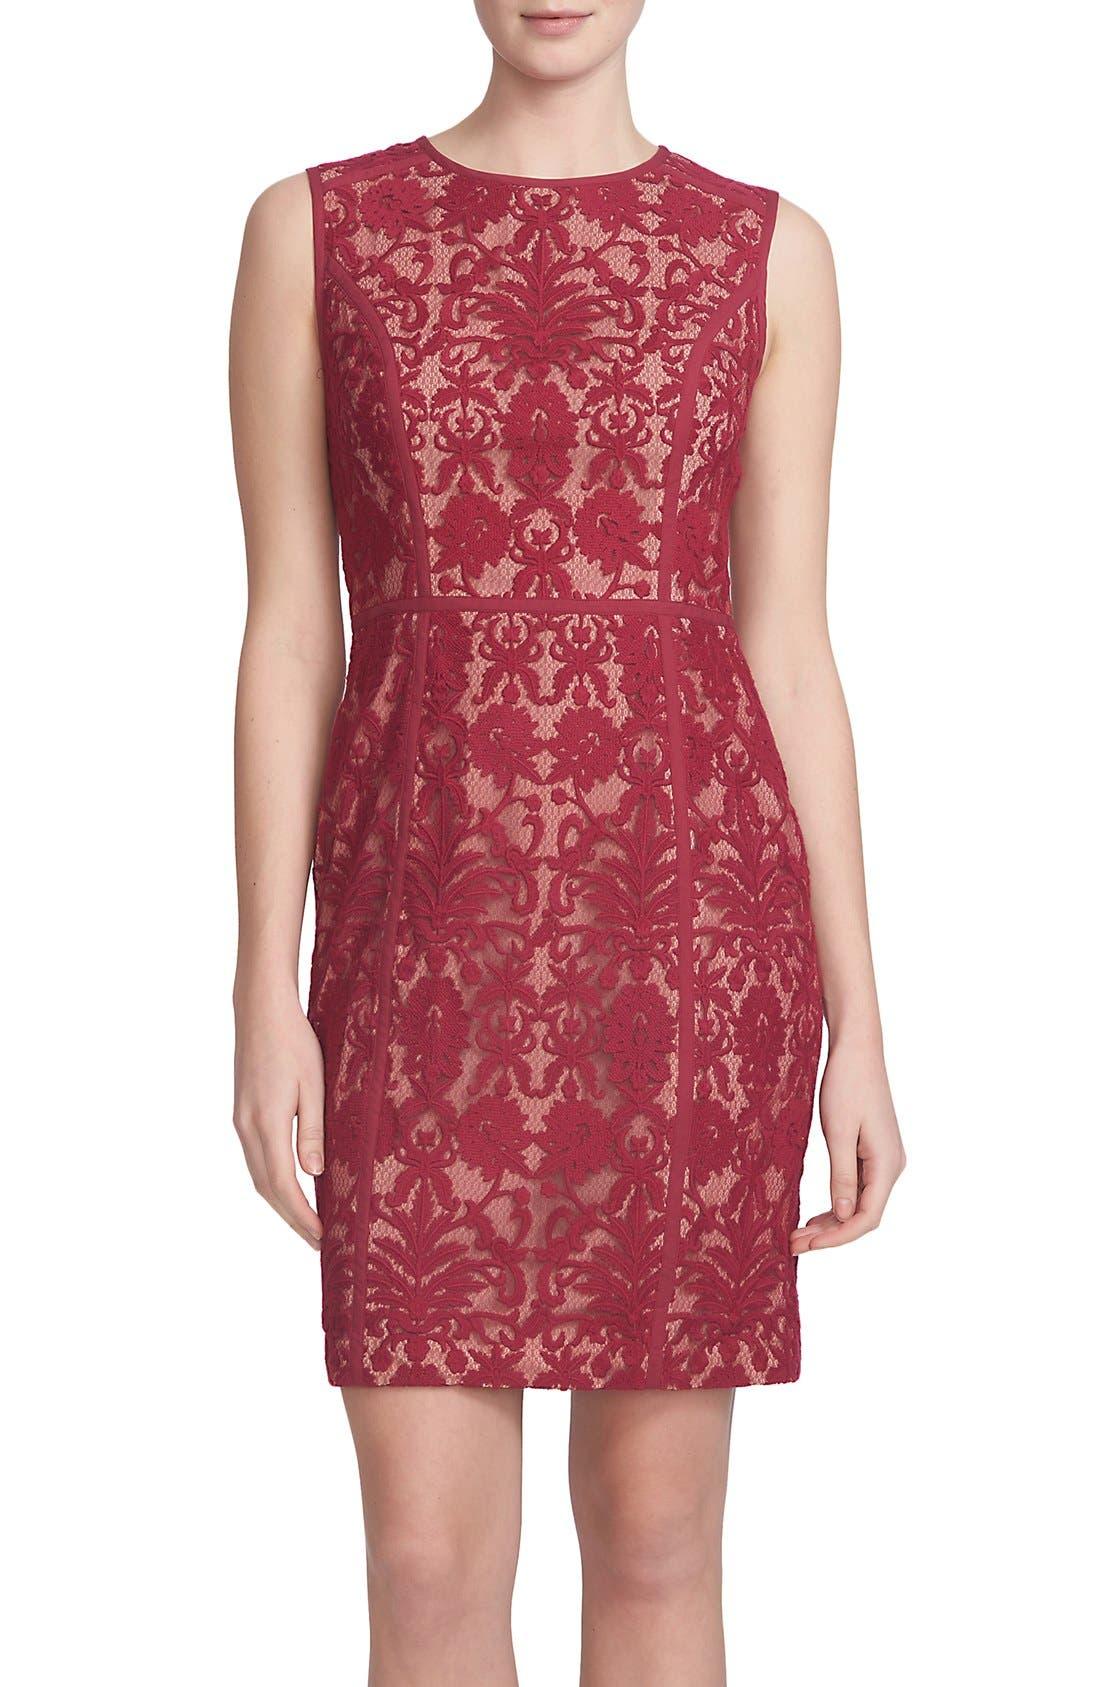 Alternate Image 1 Selected - Cynthia Steffe 'Elenora' Lace Sheath Dress